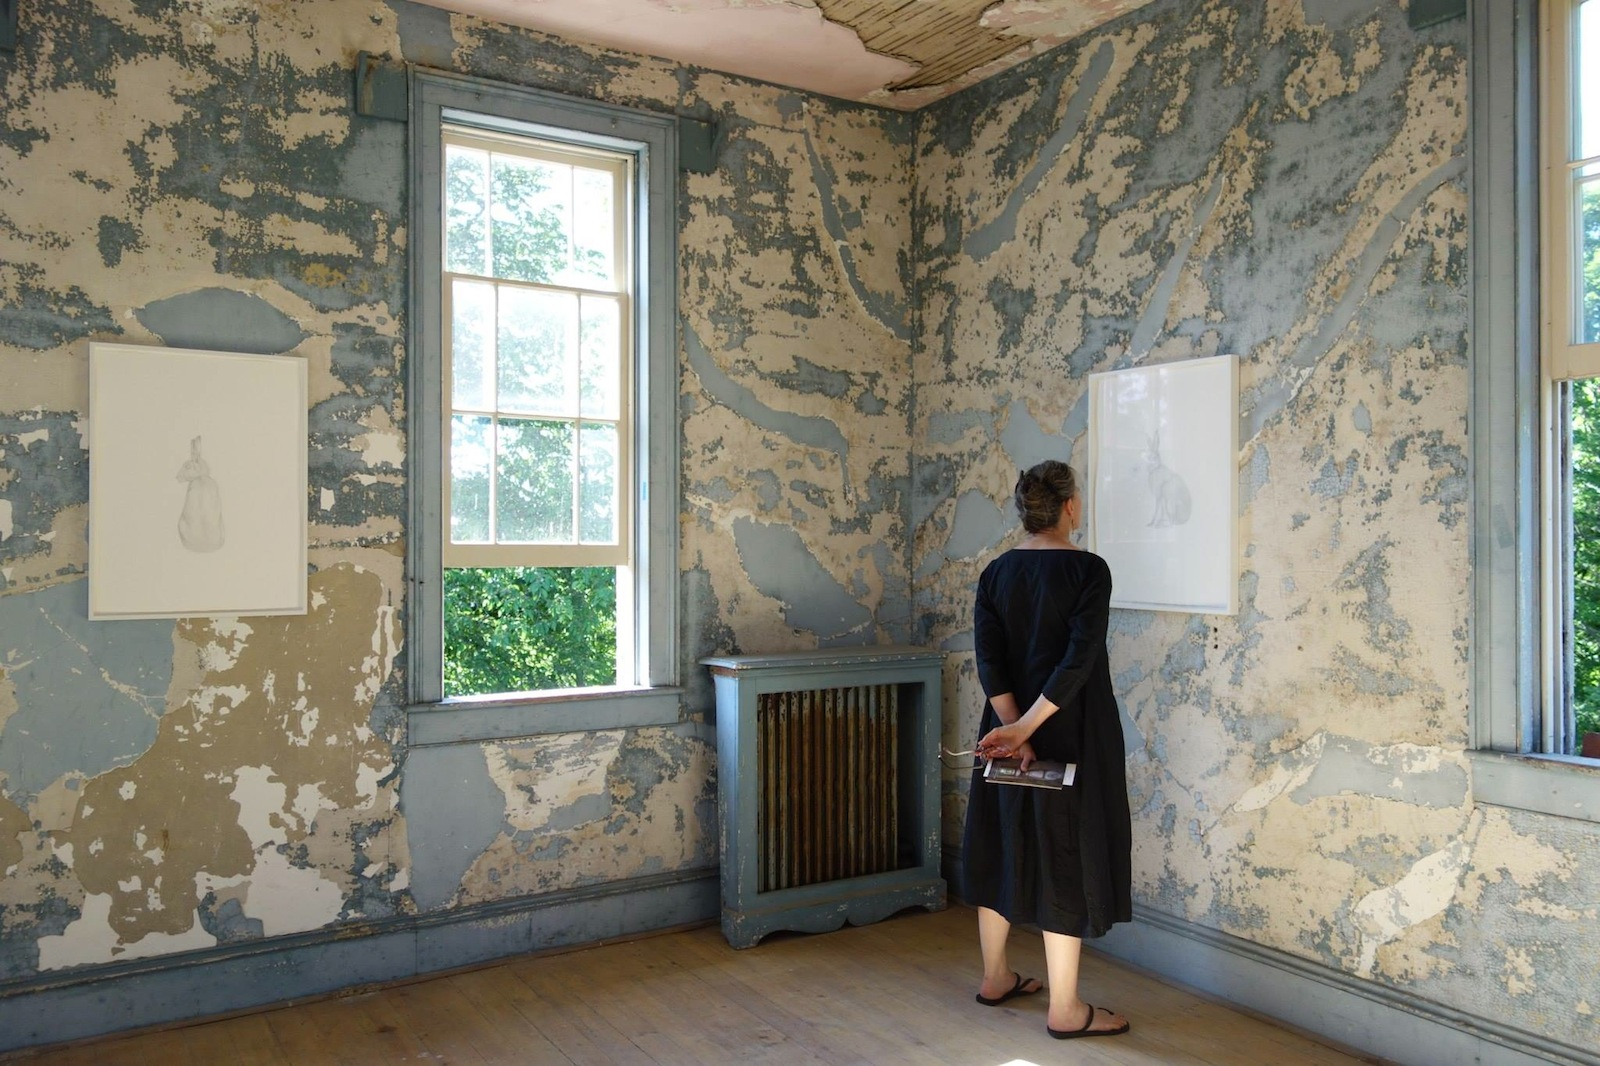 Artfully haunted hudson house features kiki smith seton for Hudson house